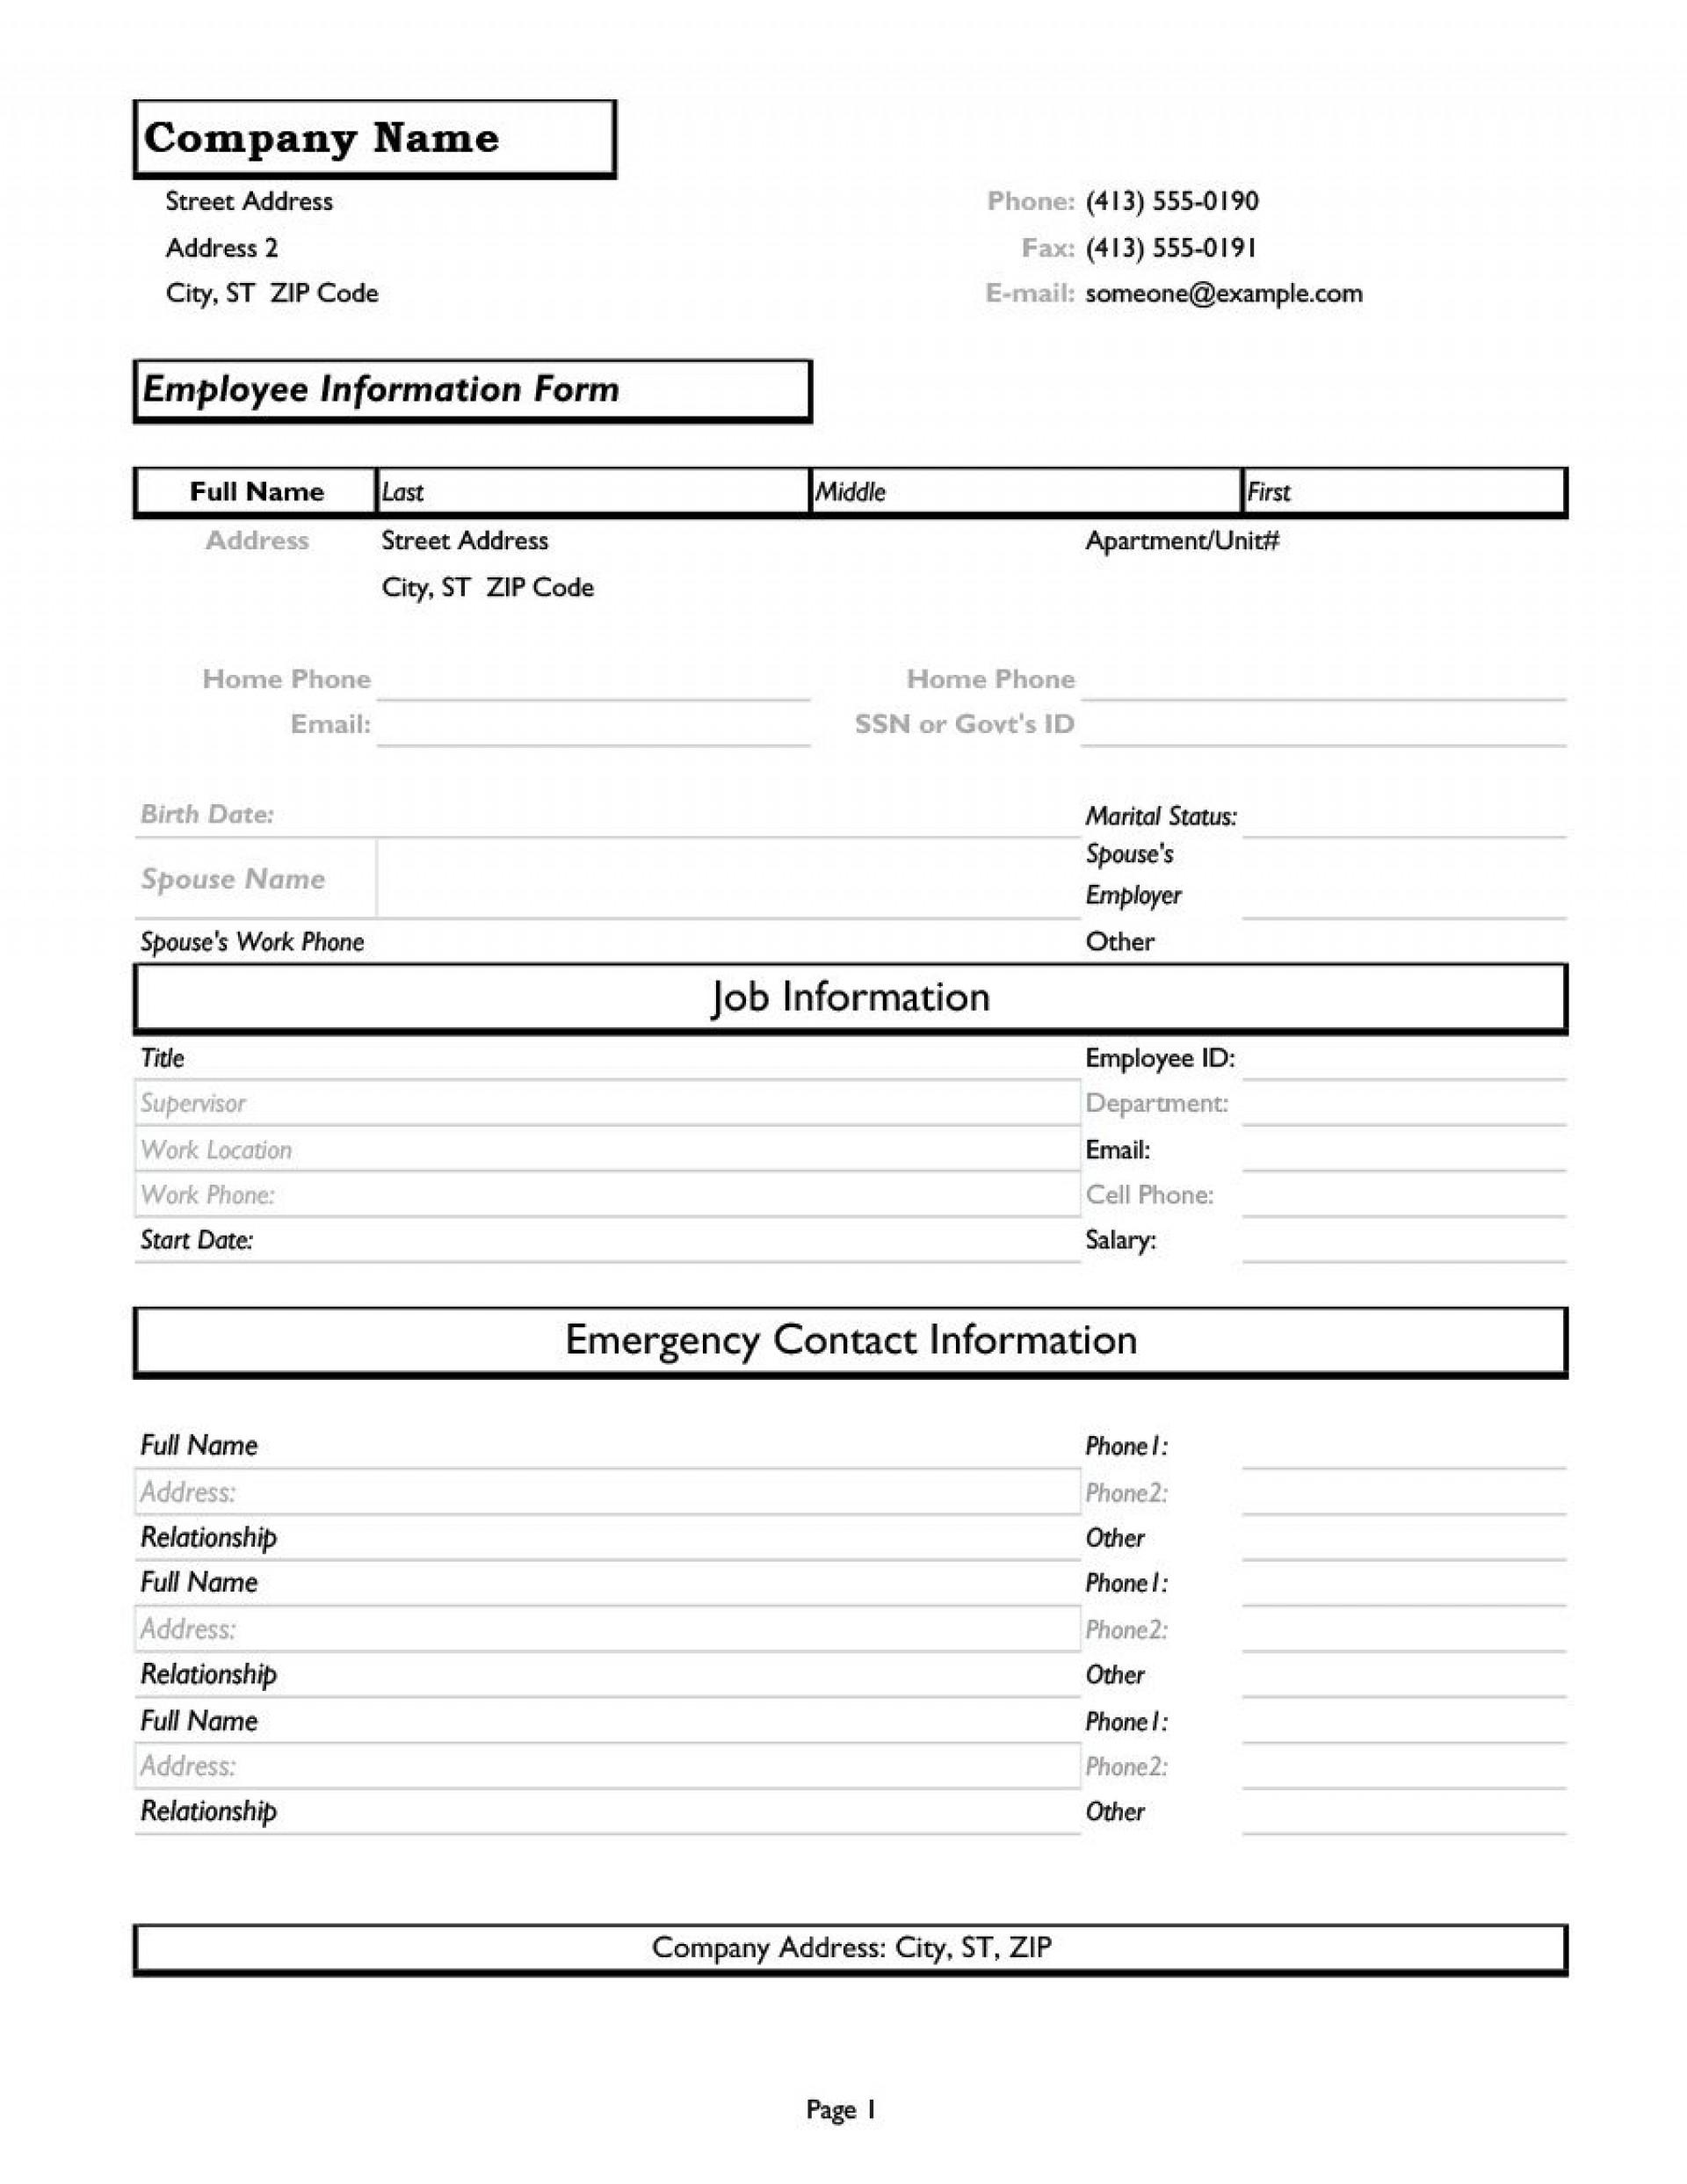 012 Unique Employee Personnel File Template Image  Uk Form Checklist1920